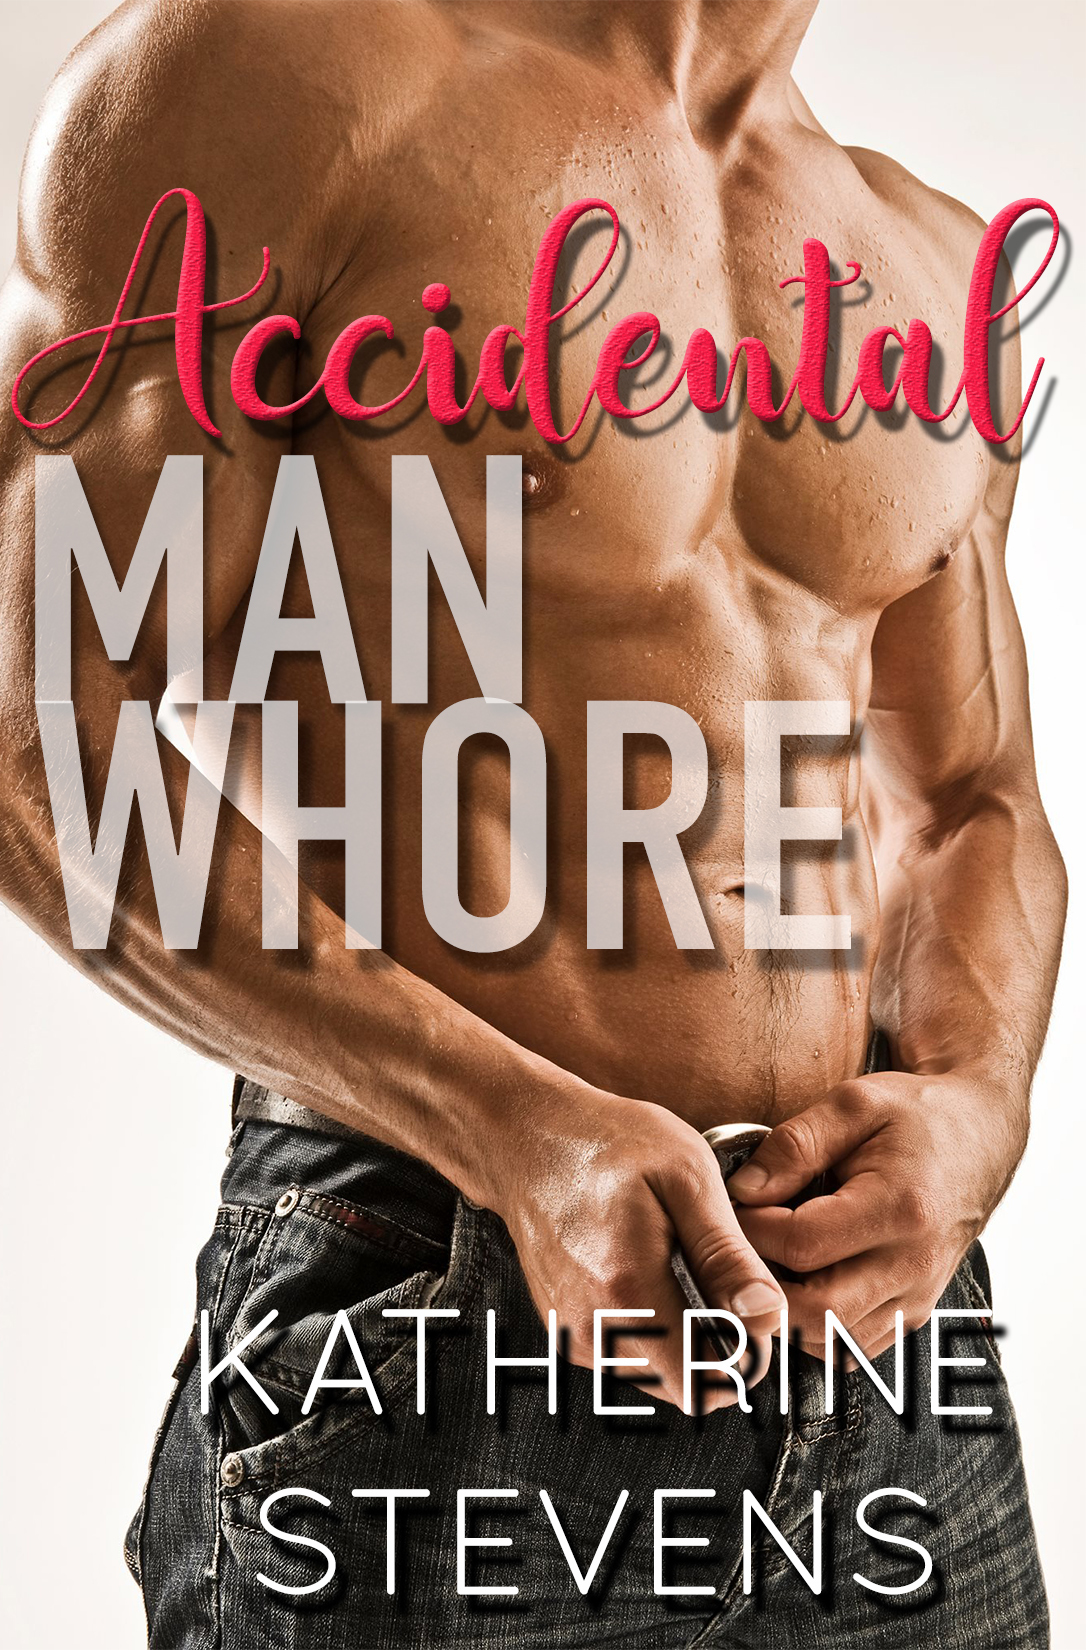 Accidental Man Whore